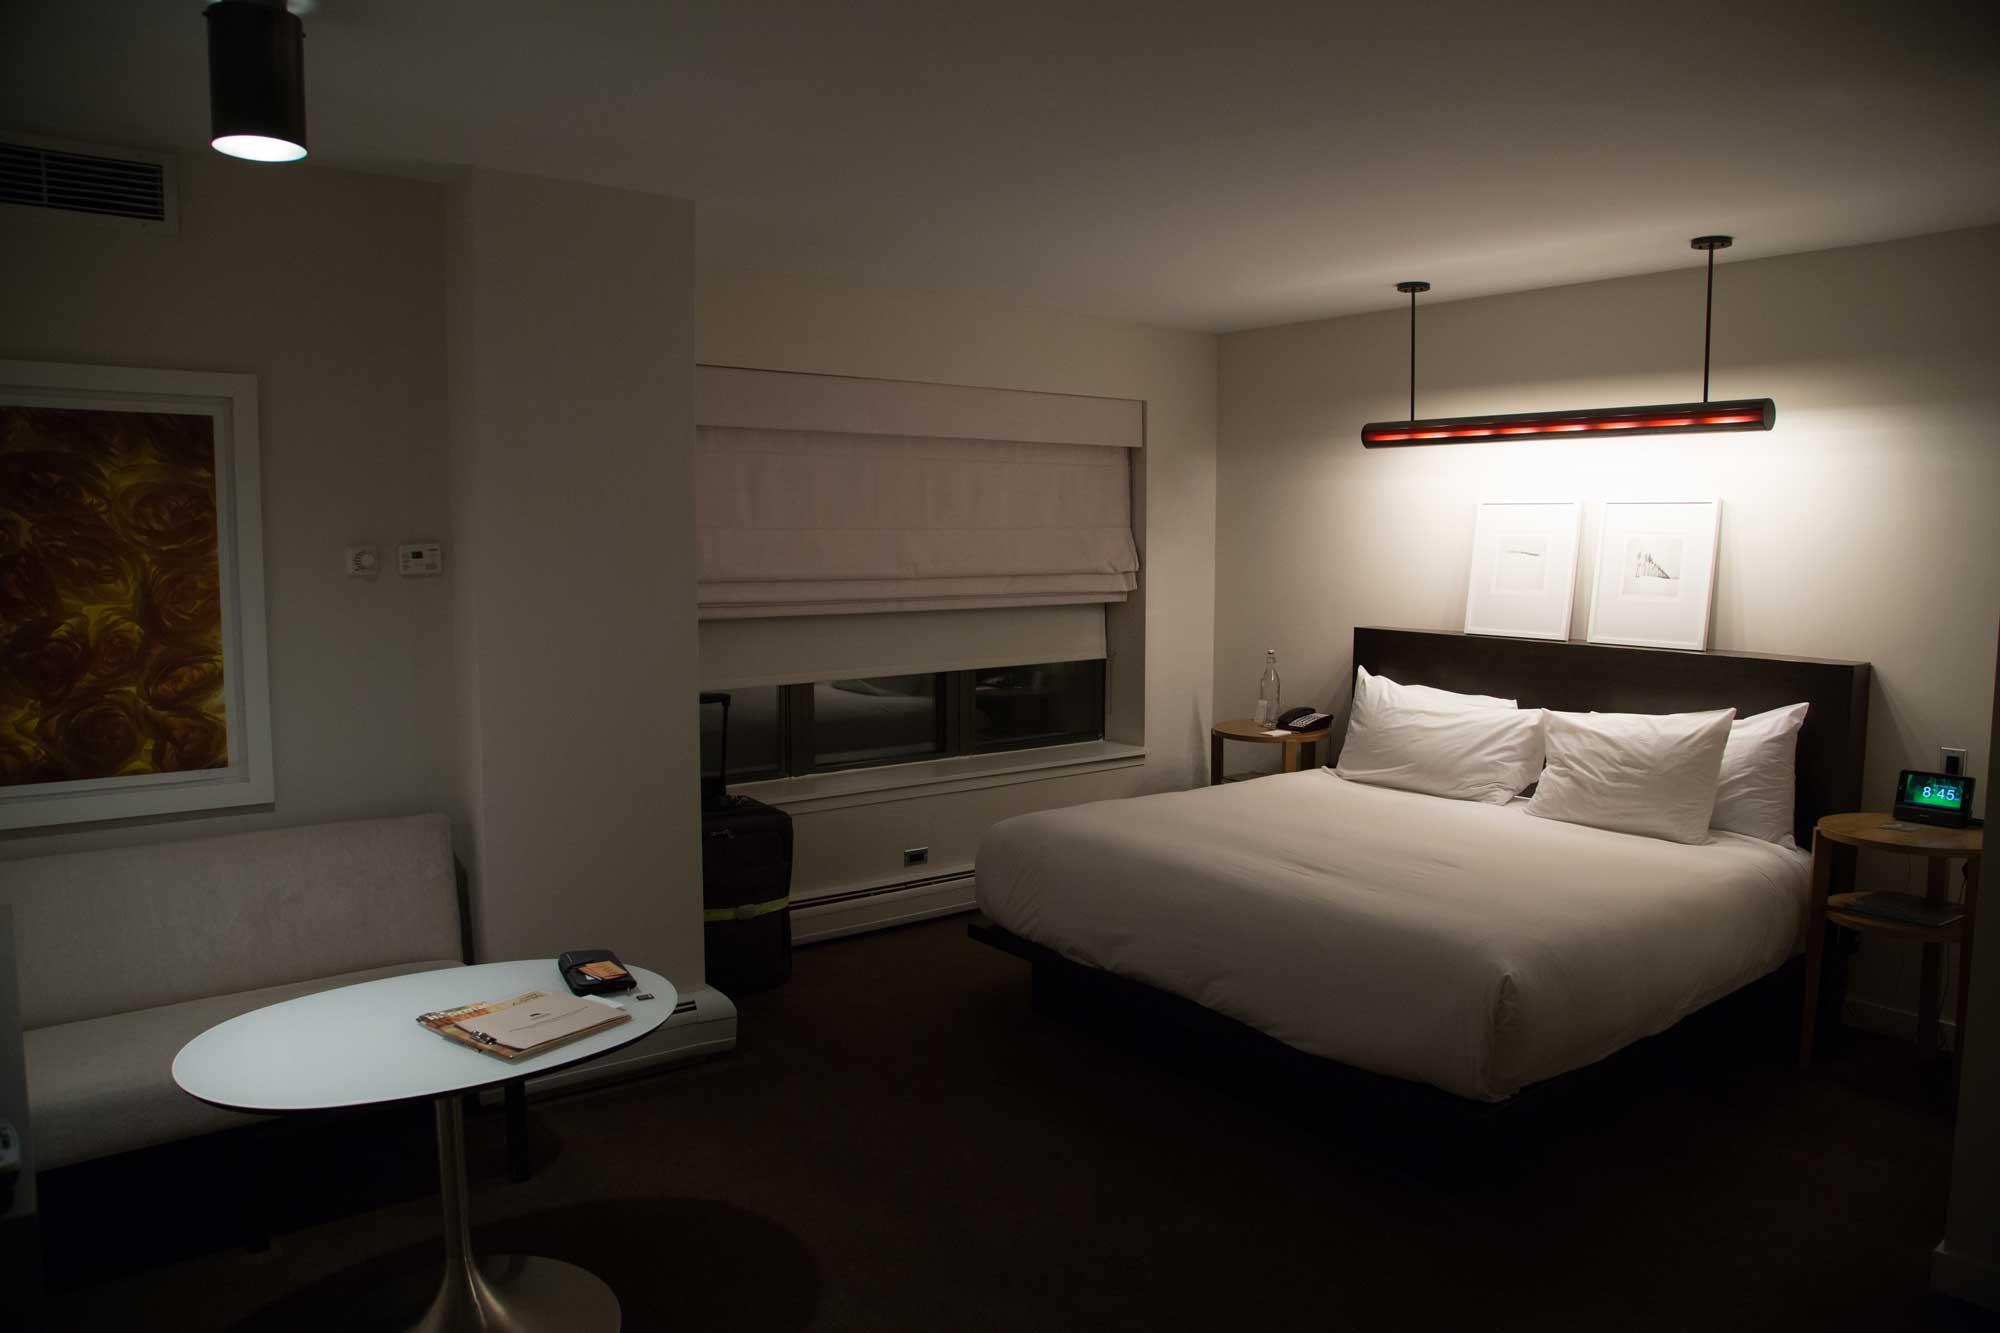 The-James-Hotel-Chicago-1.jpg